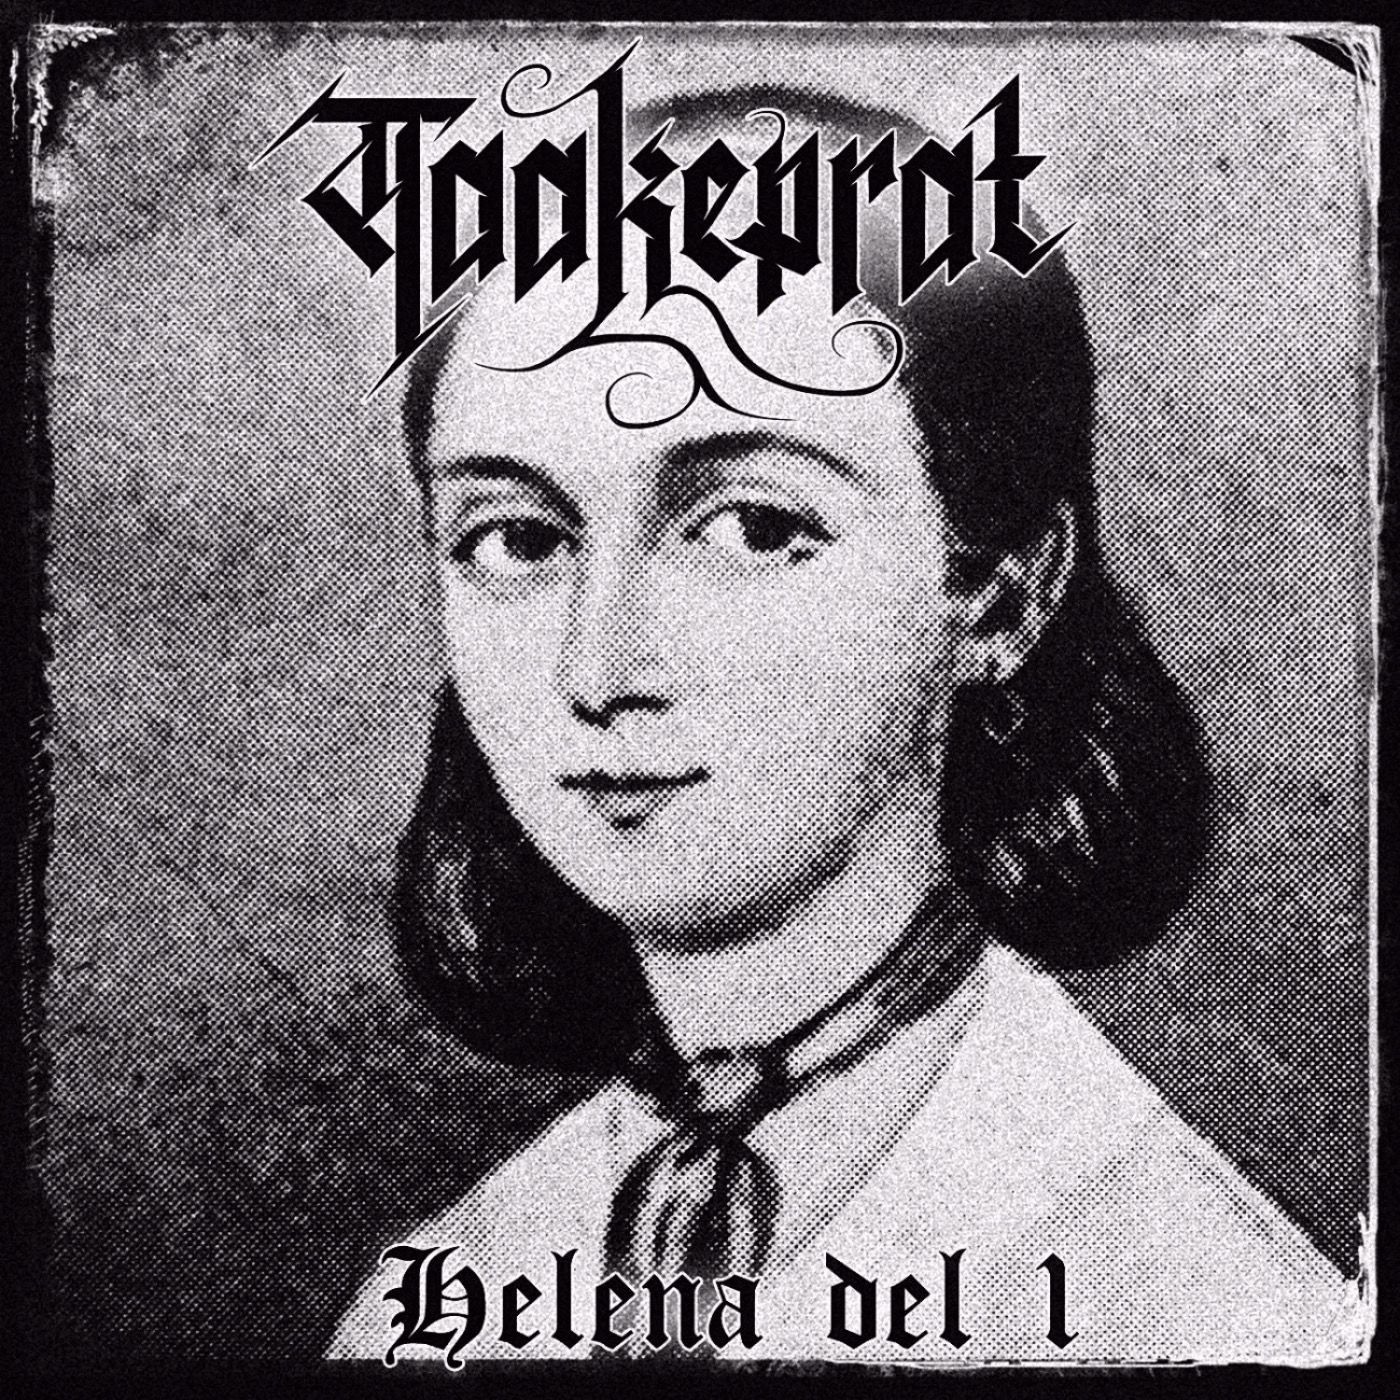 Episode 112 - Helena del 1